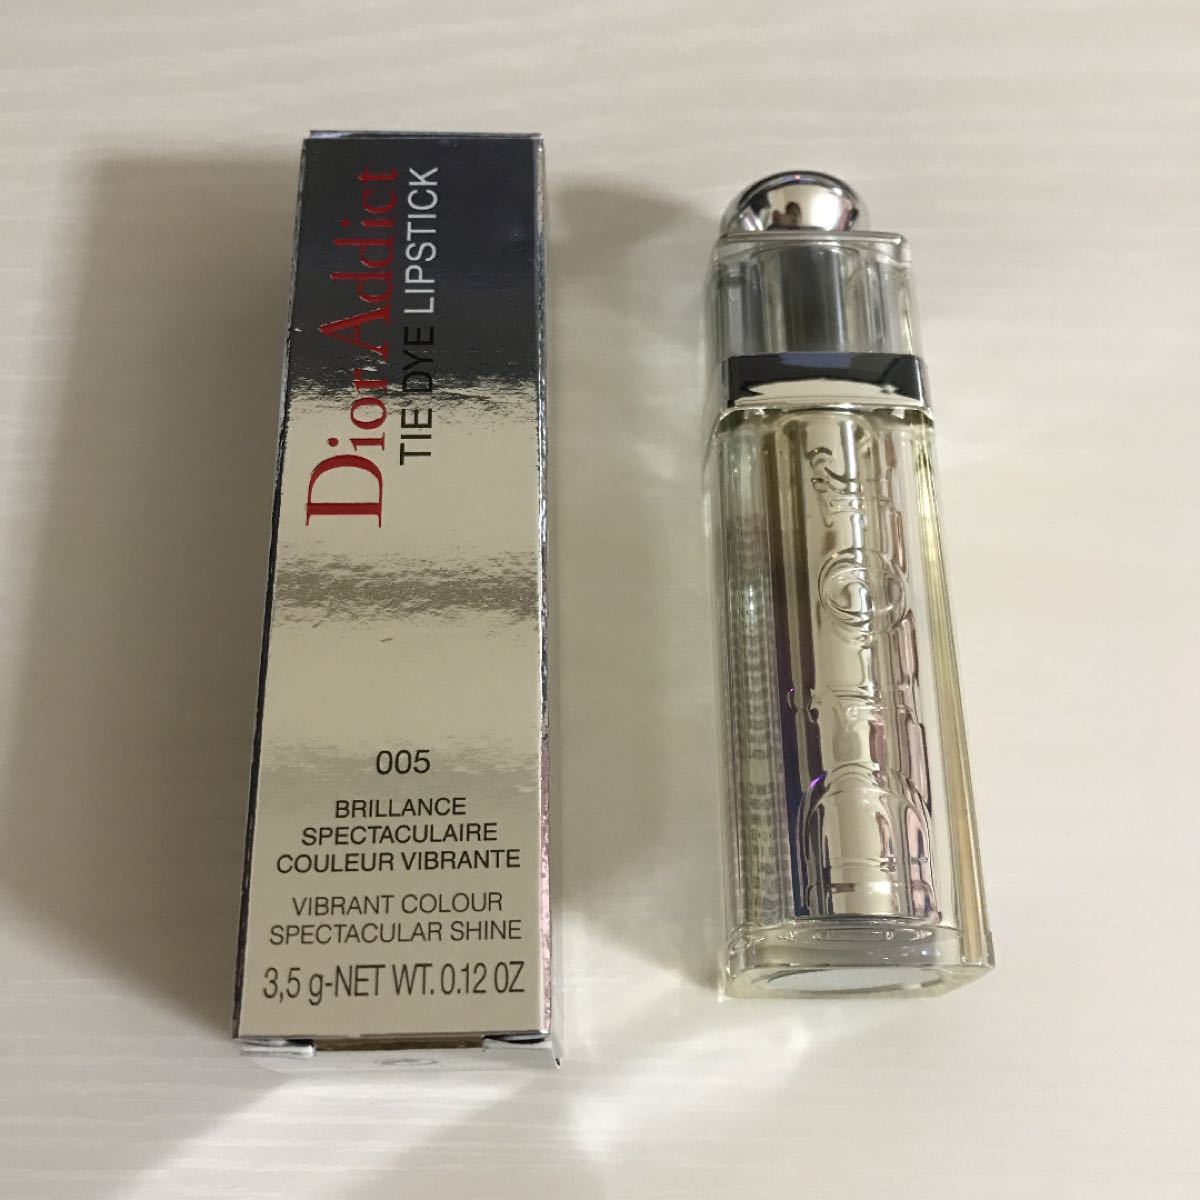 Dior ディオール リップスティック タイダイ エディション 005